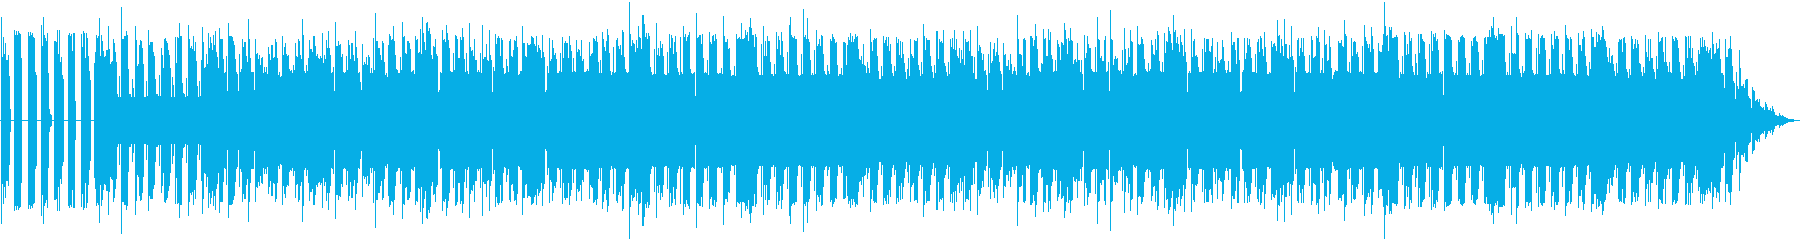 【8bit】敵城ドキドキボスキャッスルの再生済みの波形